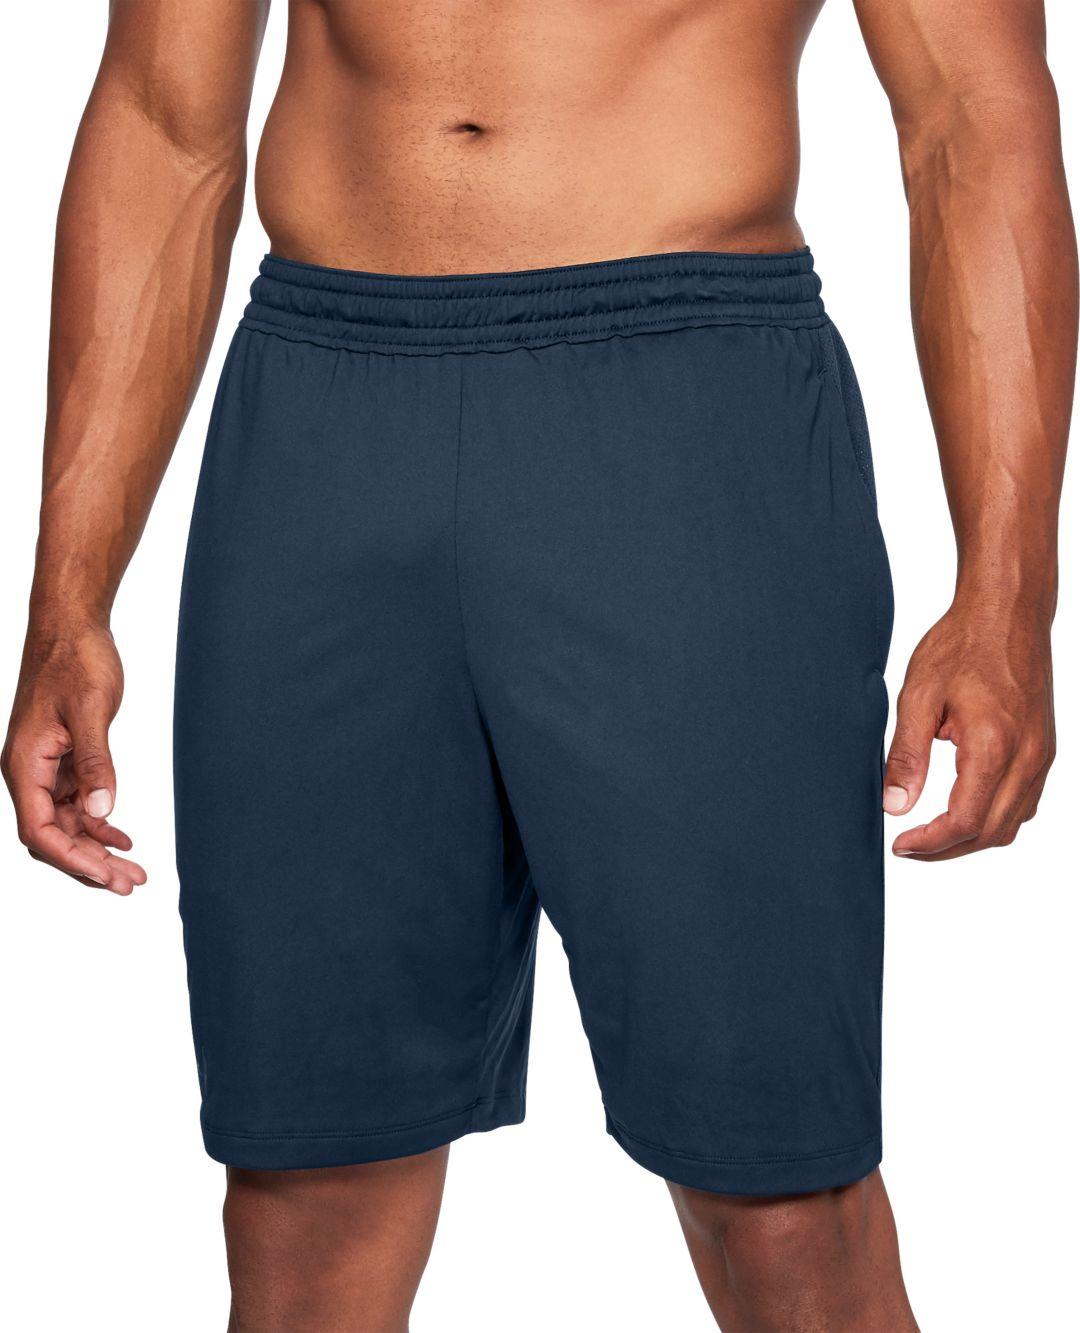 c2283e0458d0da Under Armour Men's MK-1 Shorts. noImageFound. Previous